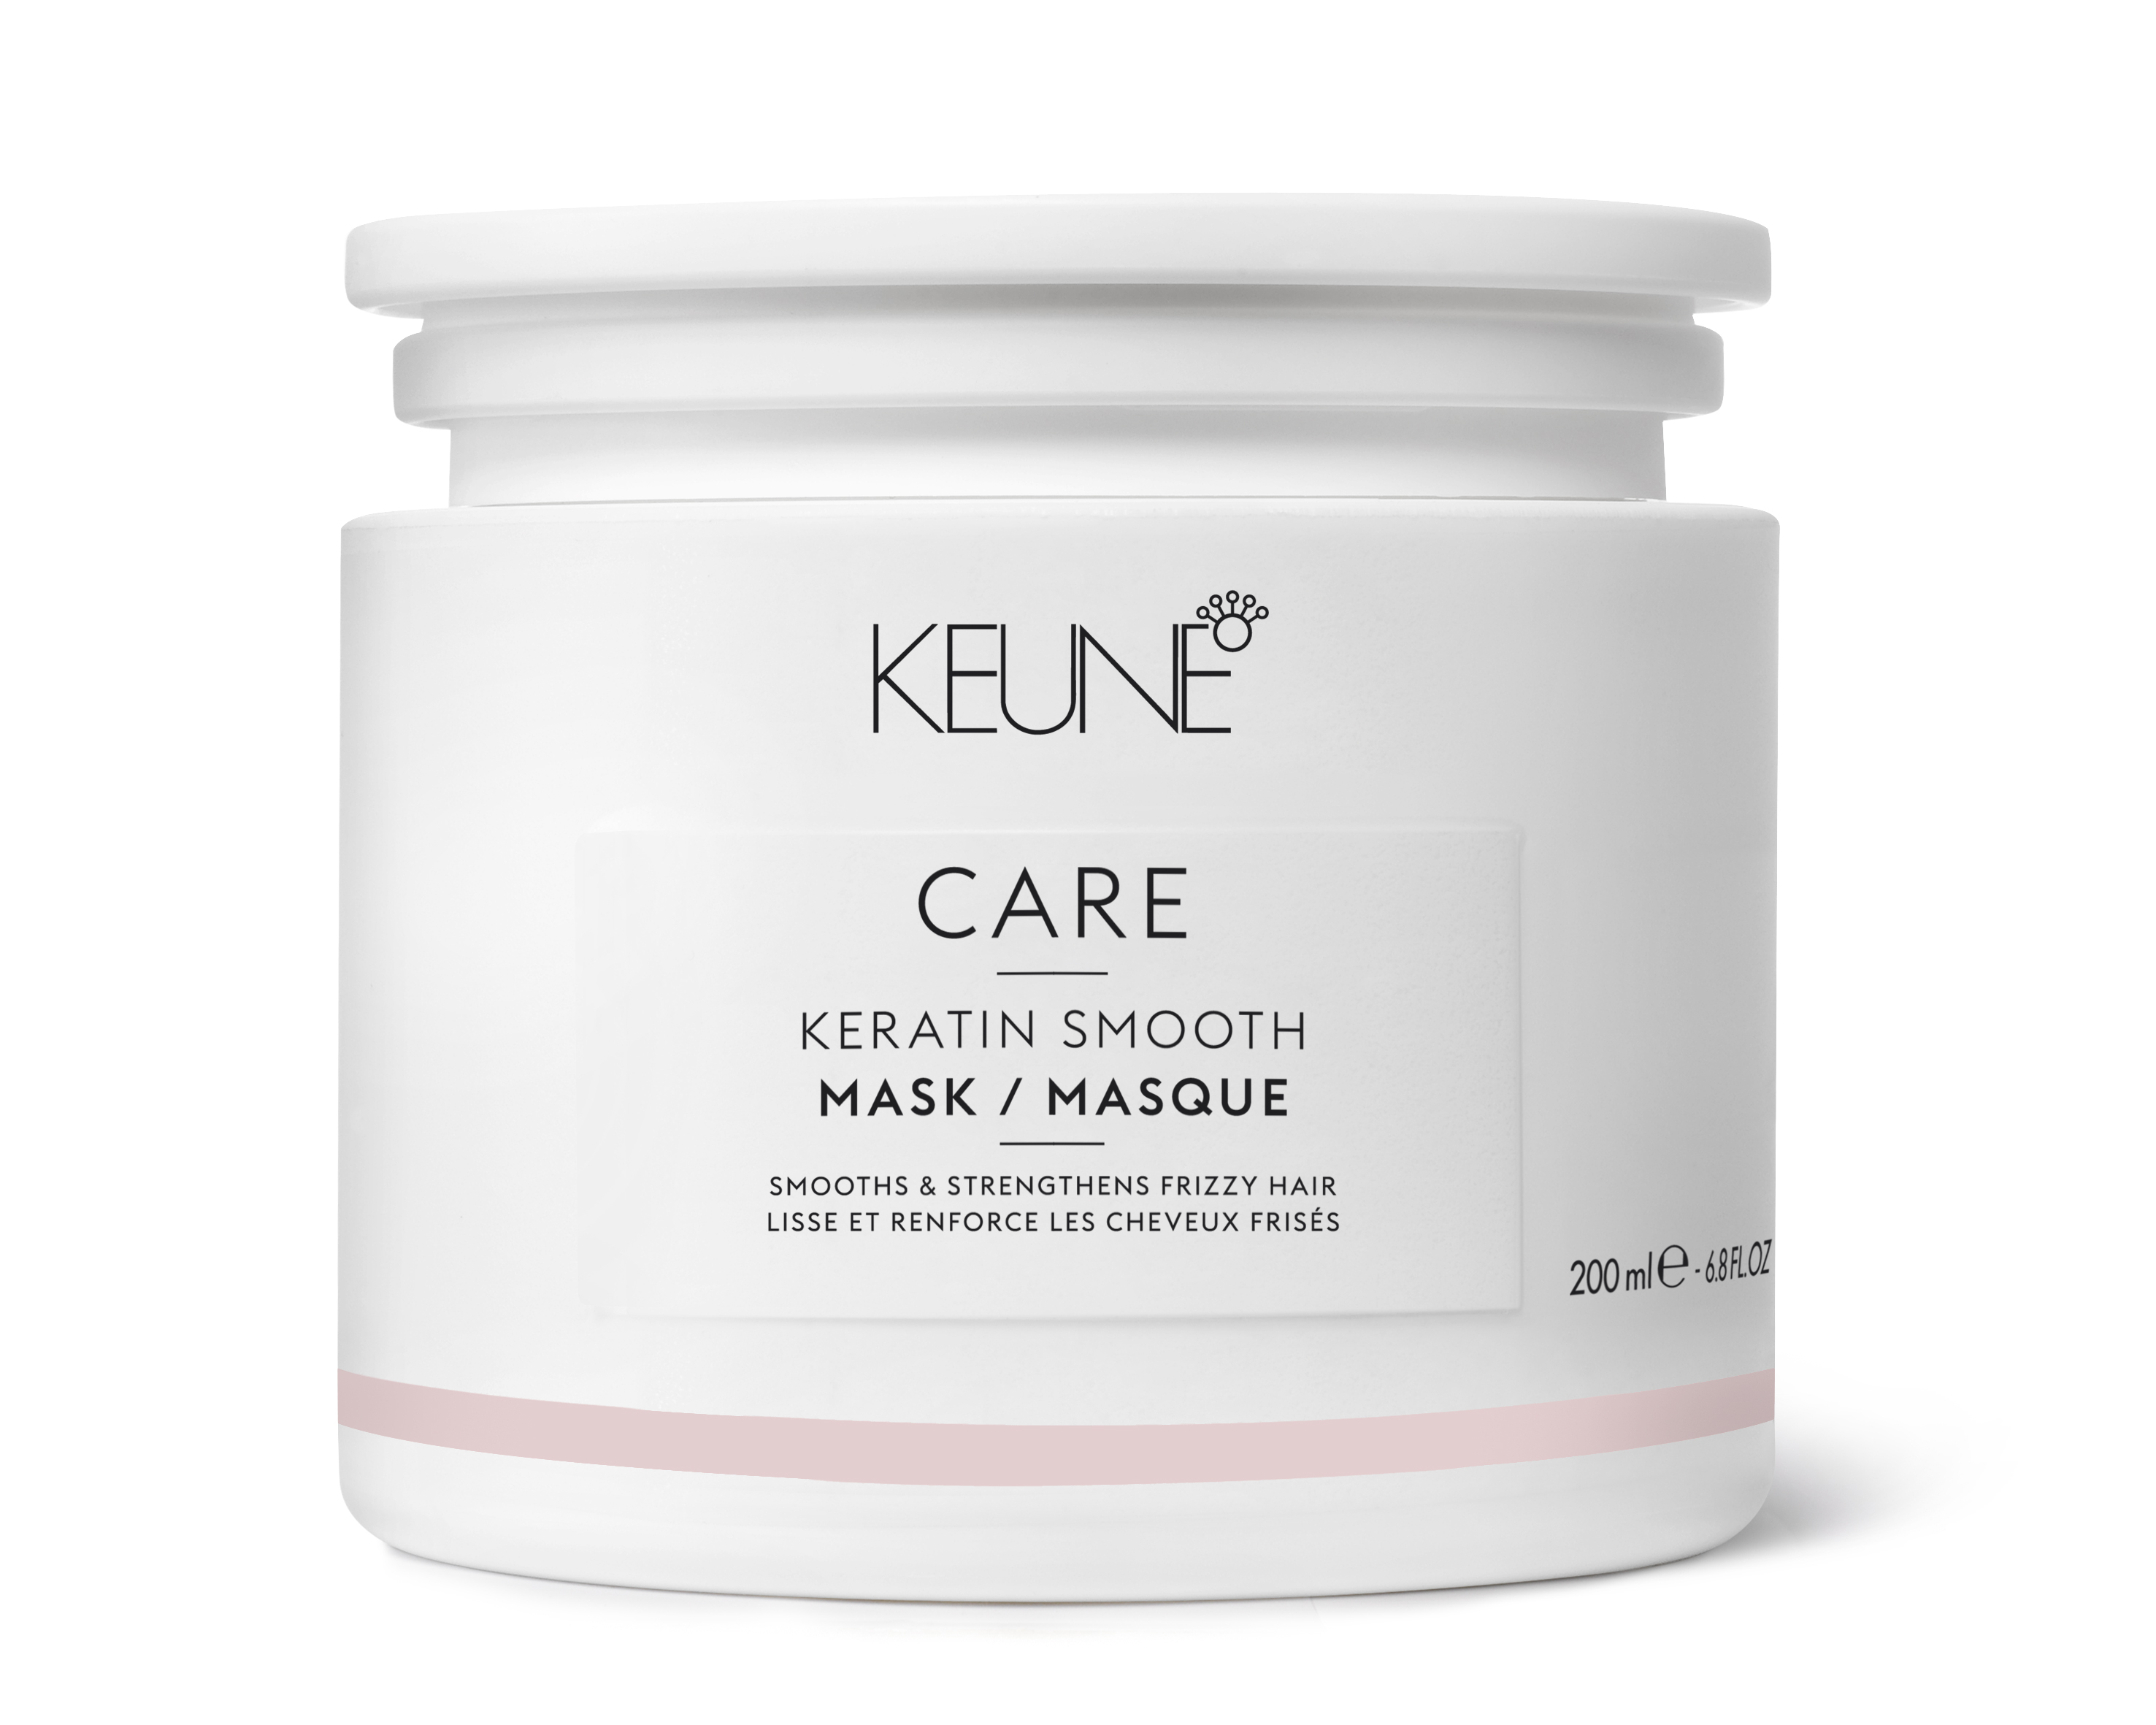 KEUNE Маска Кератиновый комплекс/ CARE Keratin Smooth Mask 200мл